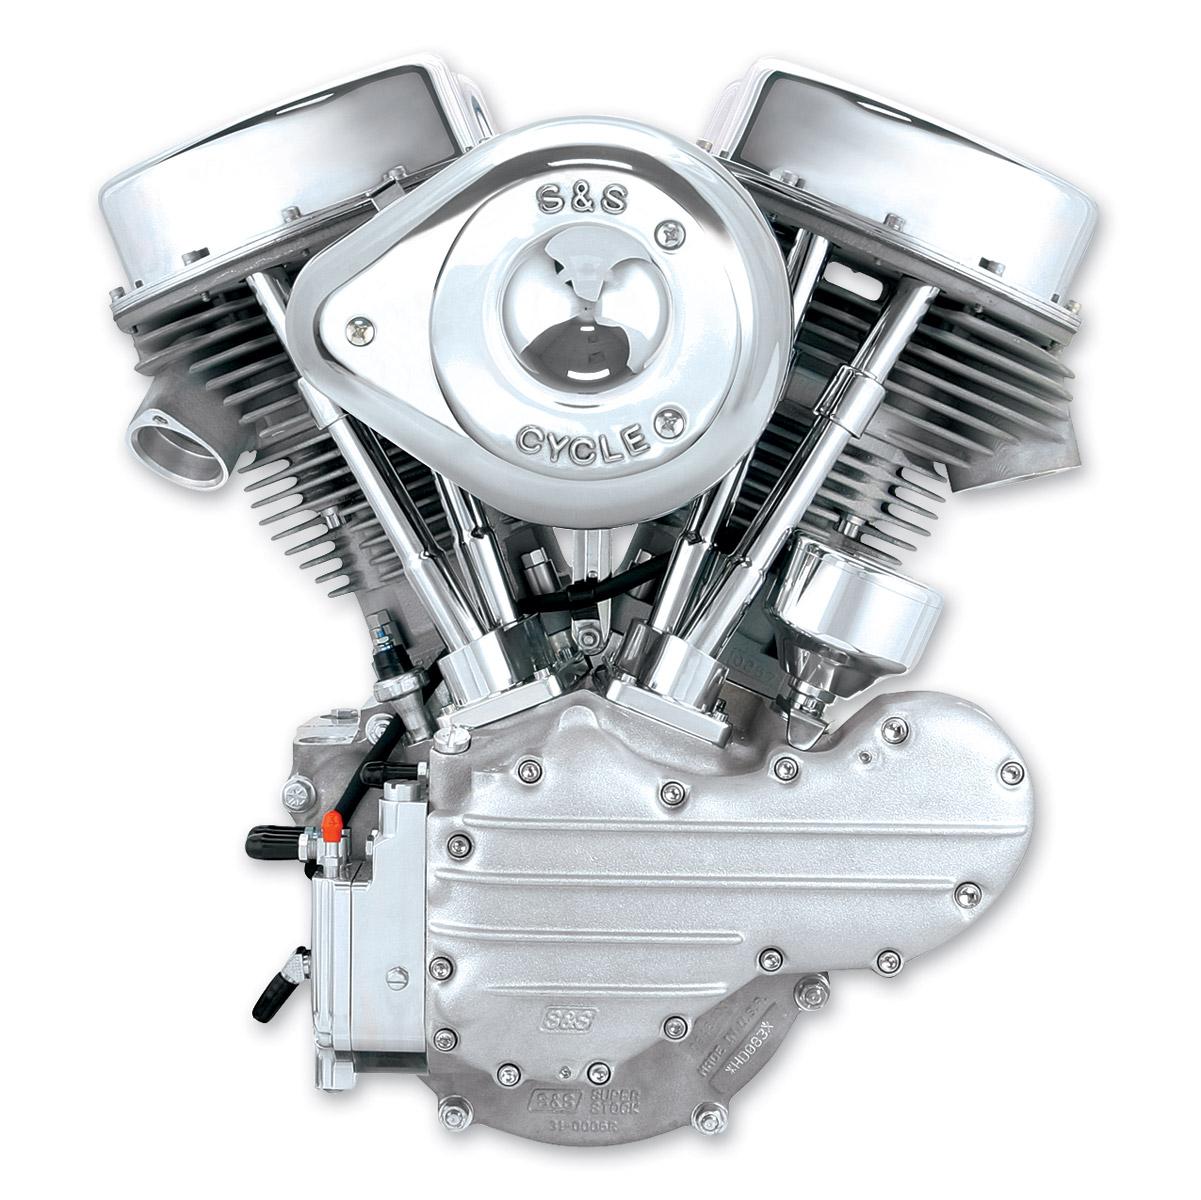 S&S Cycle P93 P Series Engine